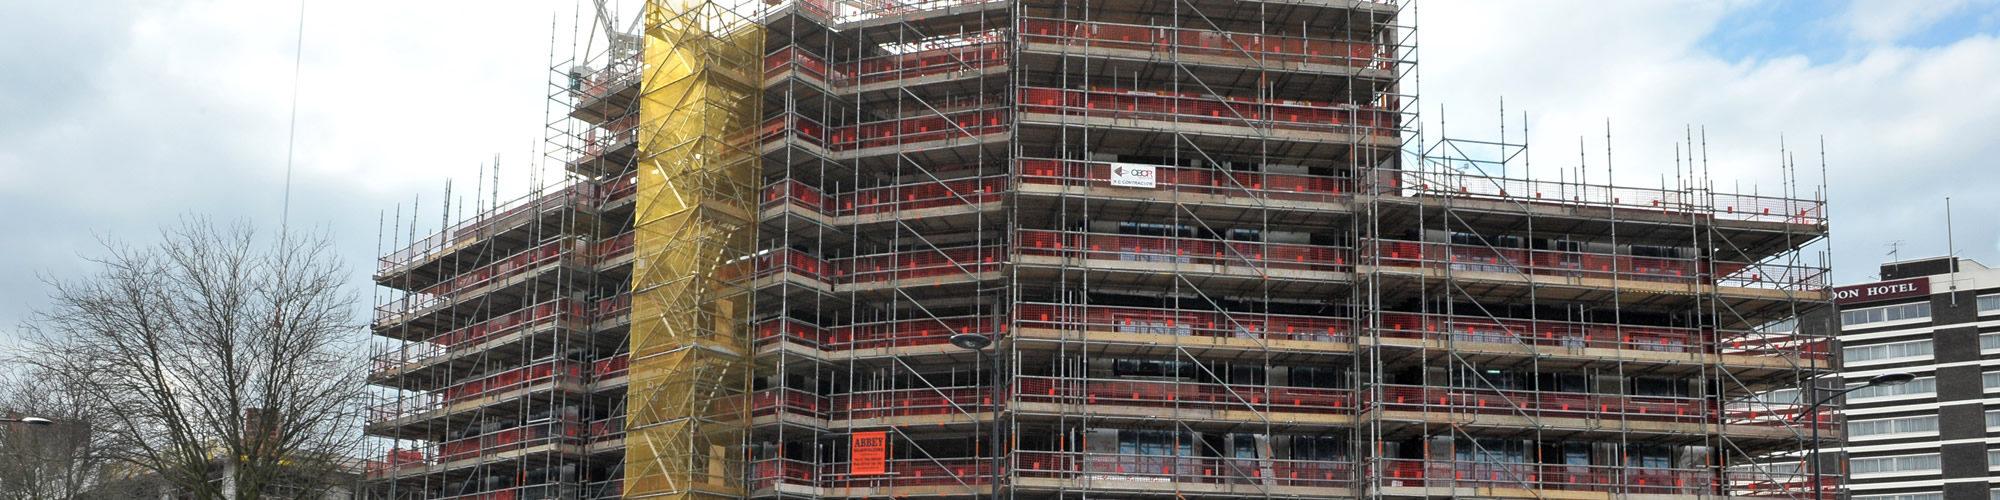 banner-sytem-scaffold